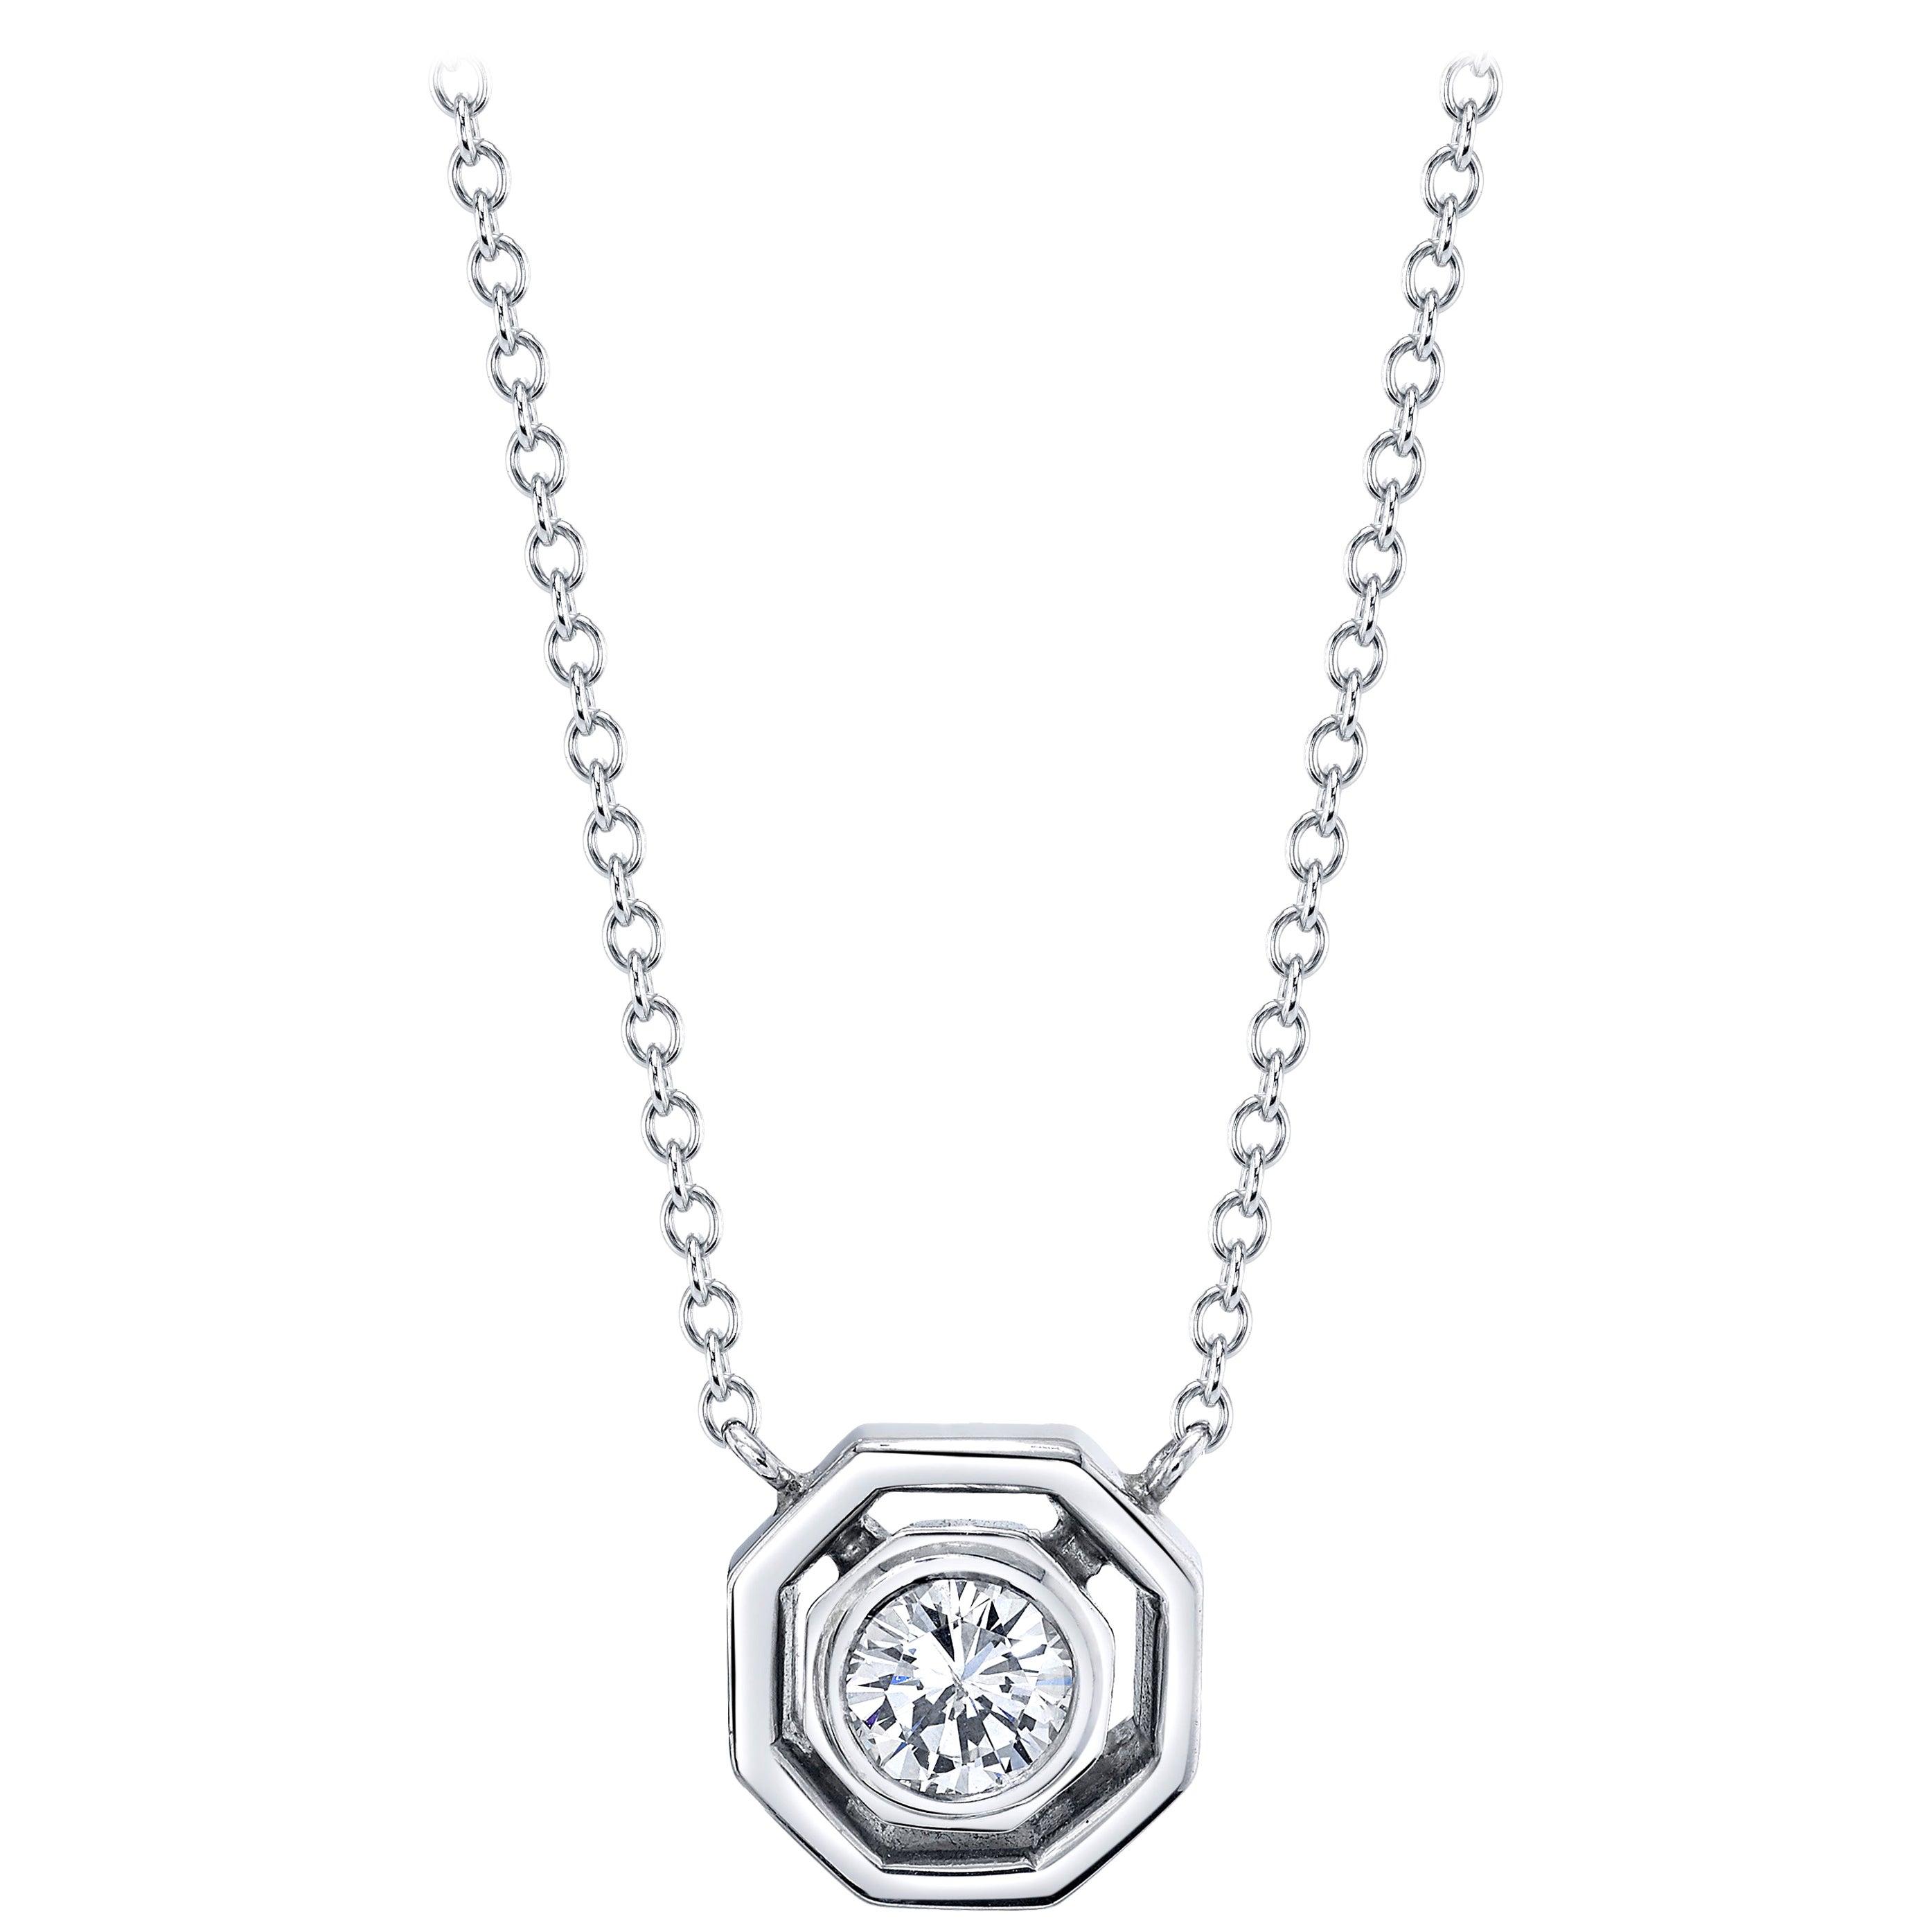 Art Deco Inspired Round Diamond, 18k White Bezel, Drop Pendant Chain Necklace